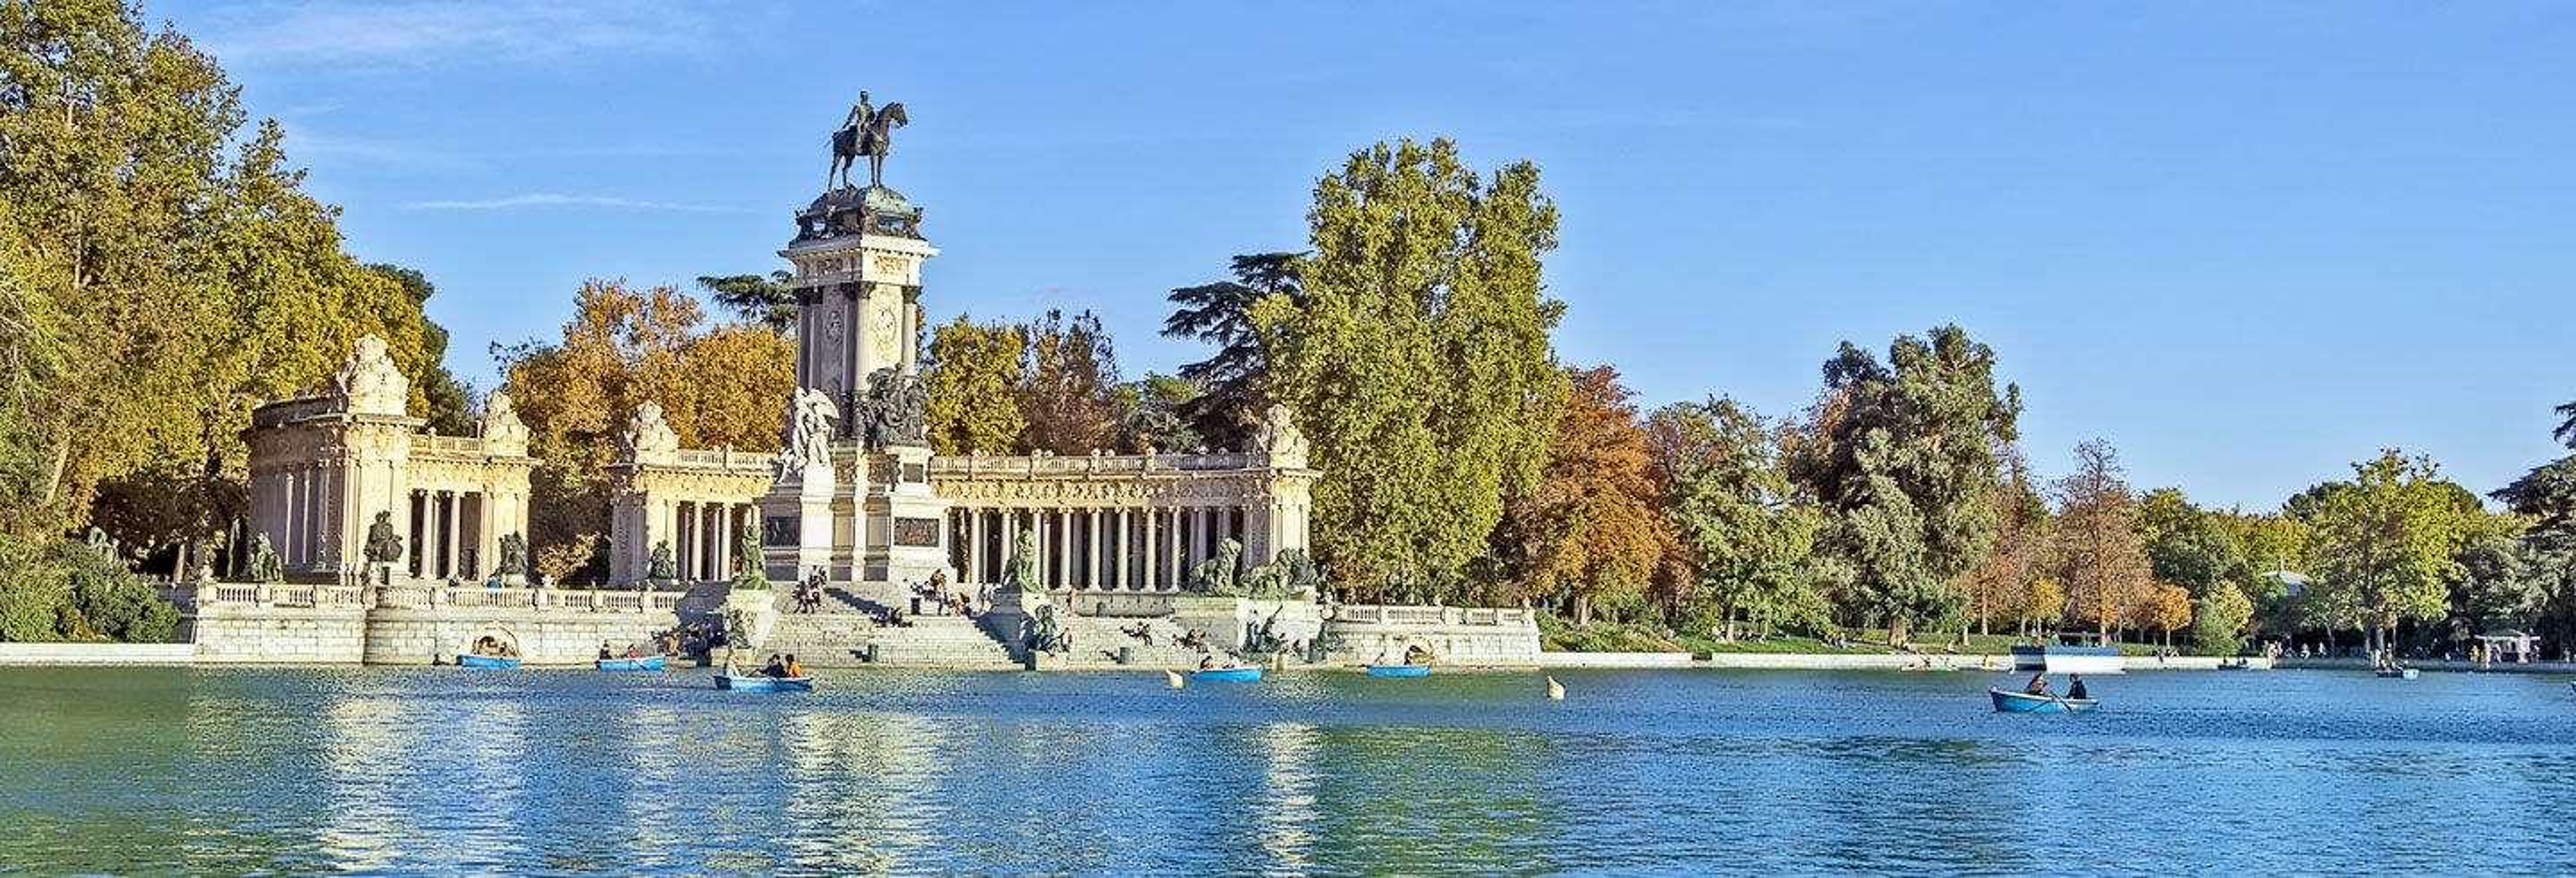 Visita guiada por el parque del retiro madrid for Parques de madrid espana